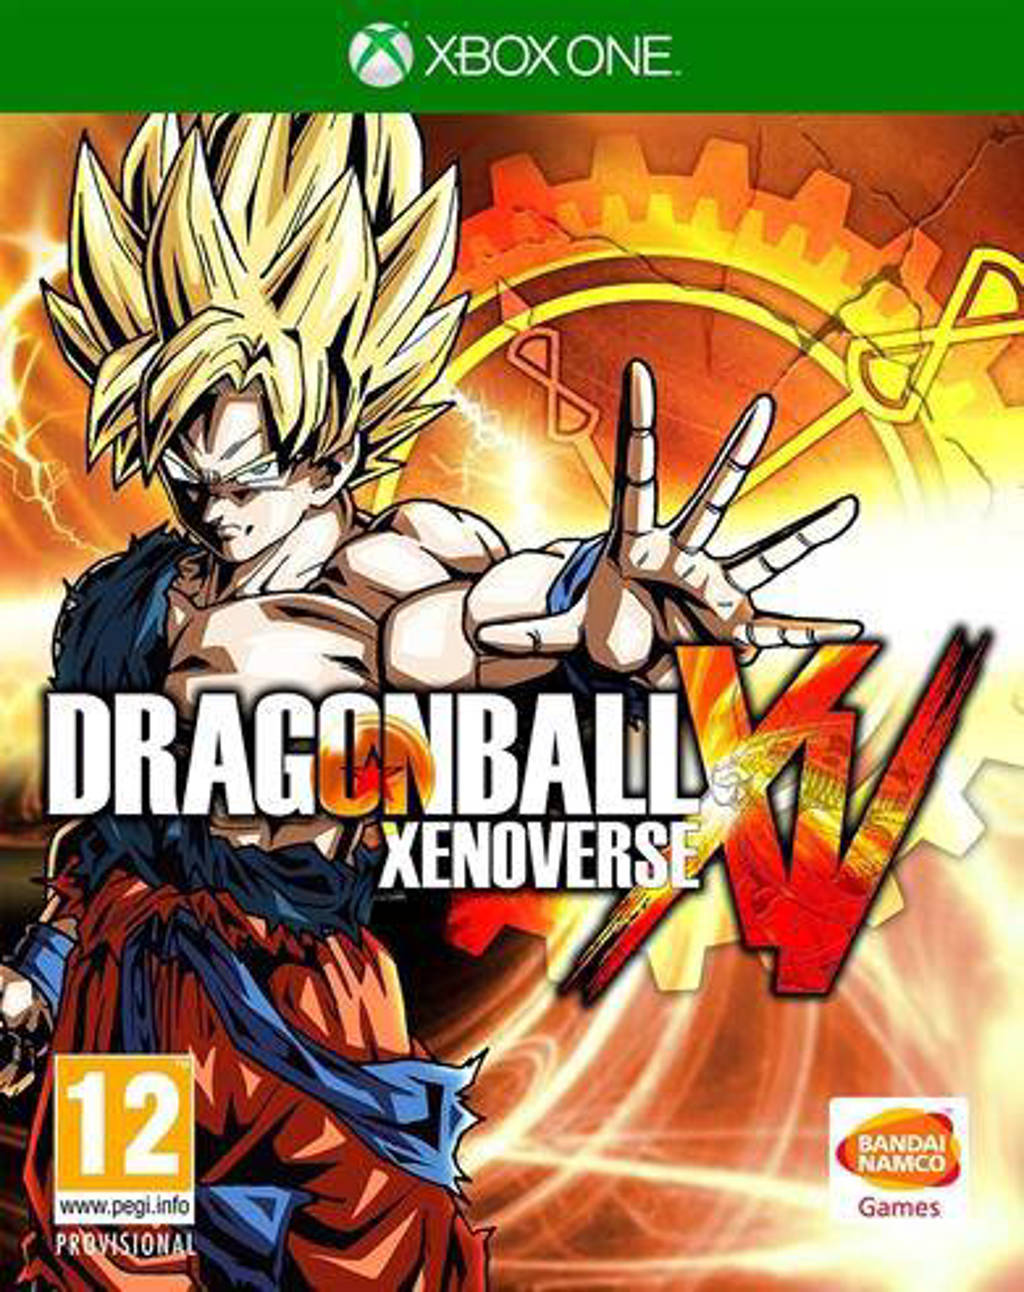 Dragon ball - Xenoverse (Hits) (Xbox One)